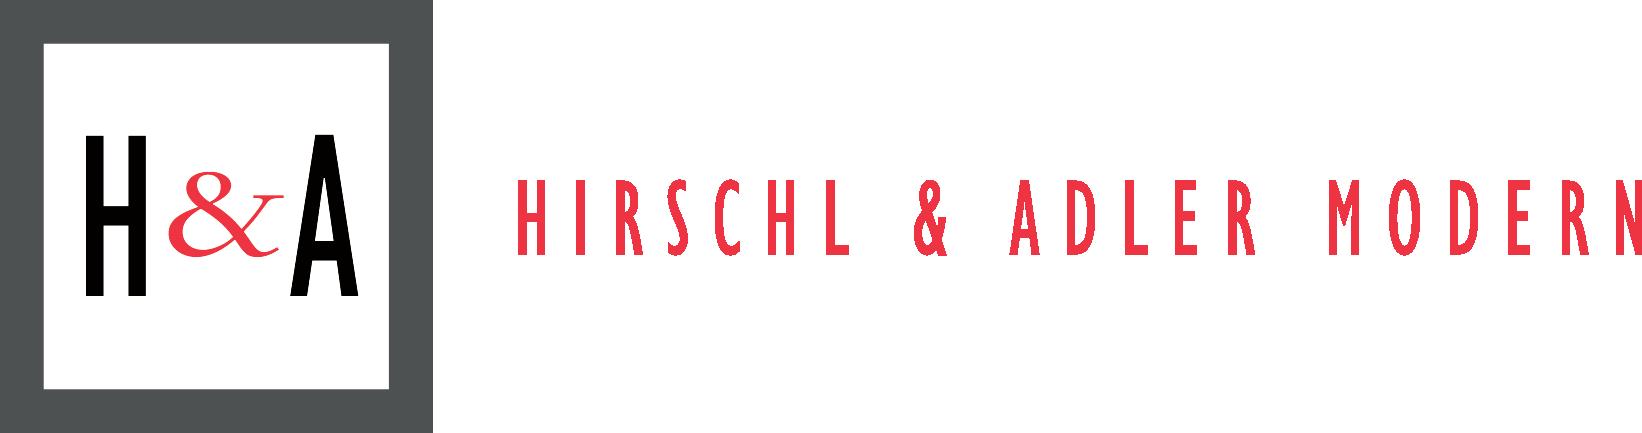 Hirschl Adler Modern